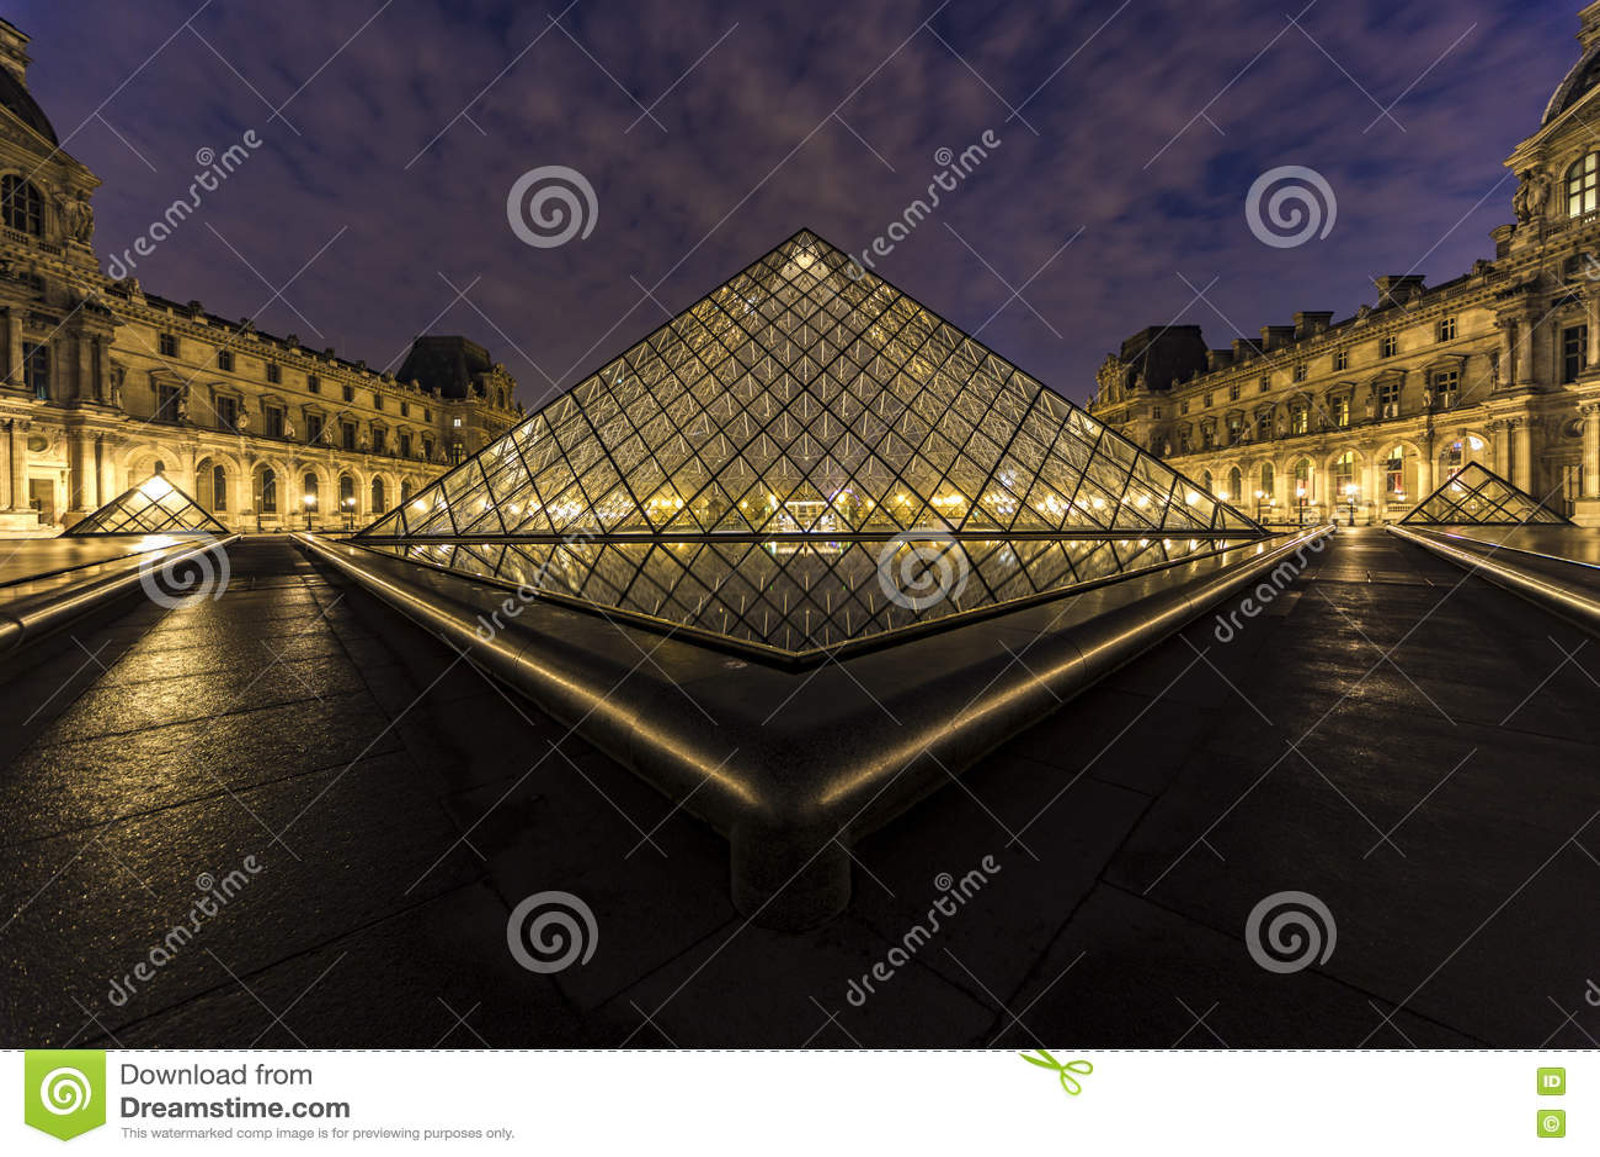 Luftschlitz-Museum - Paris